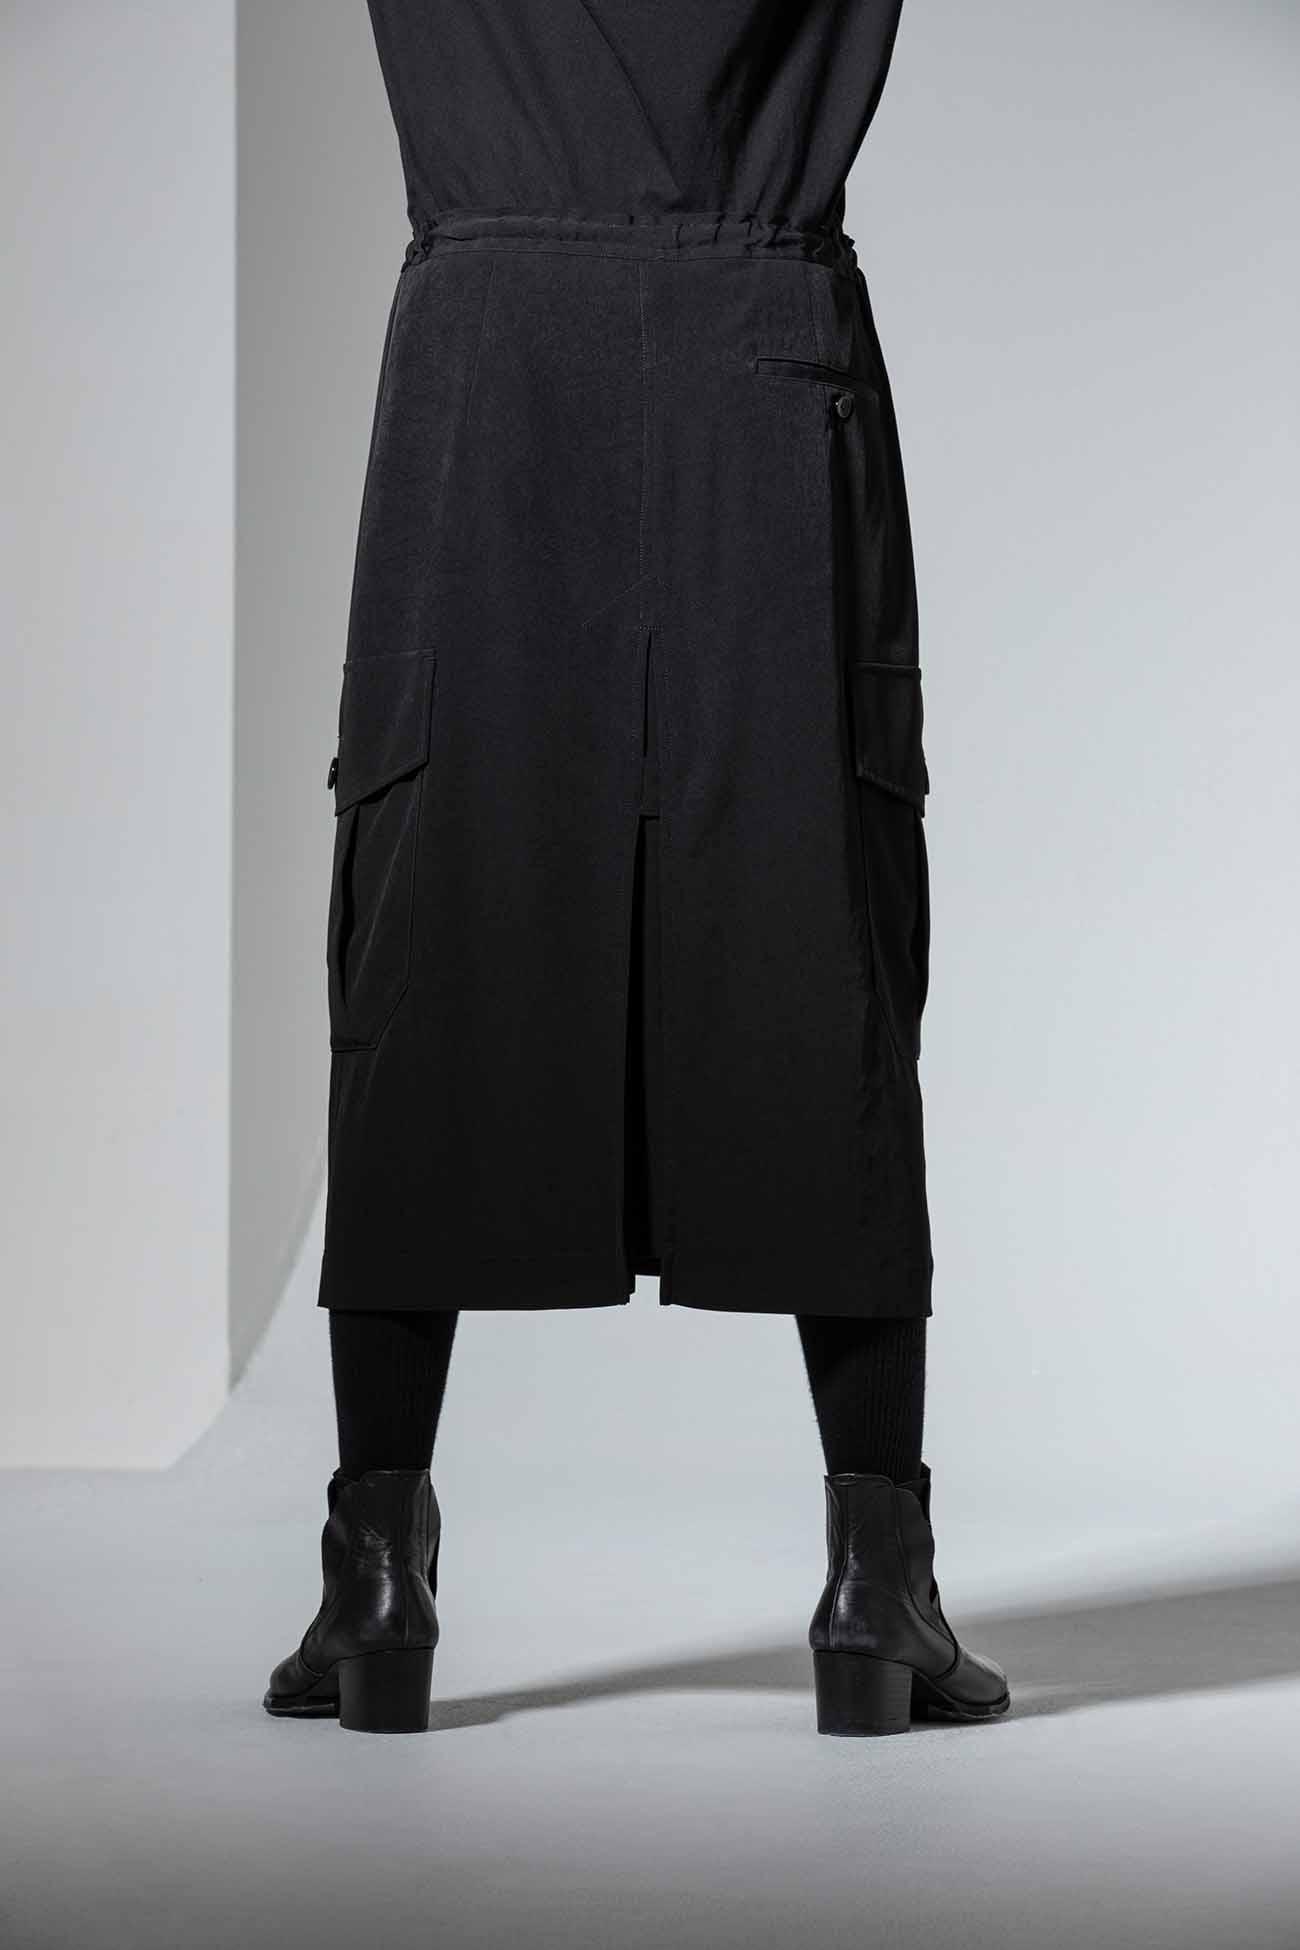 Vintage Decyne Cargo Skirt